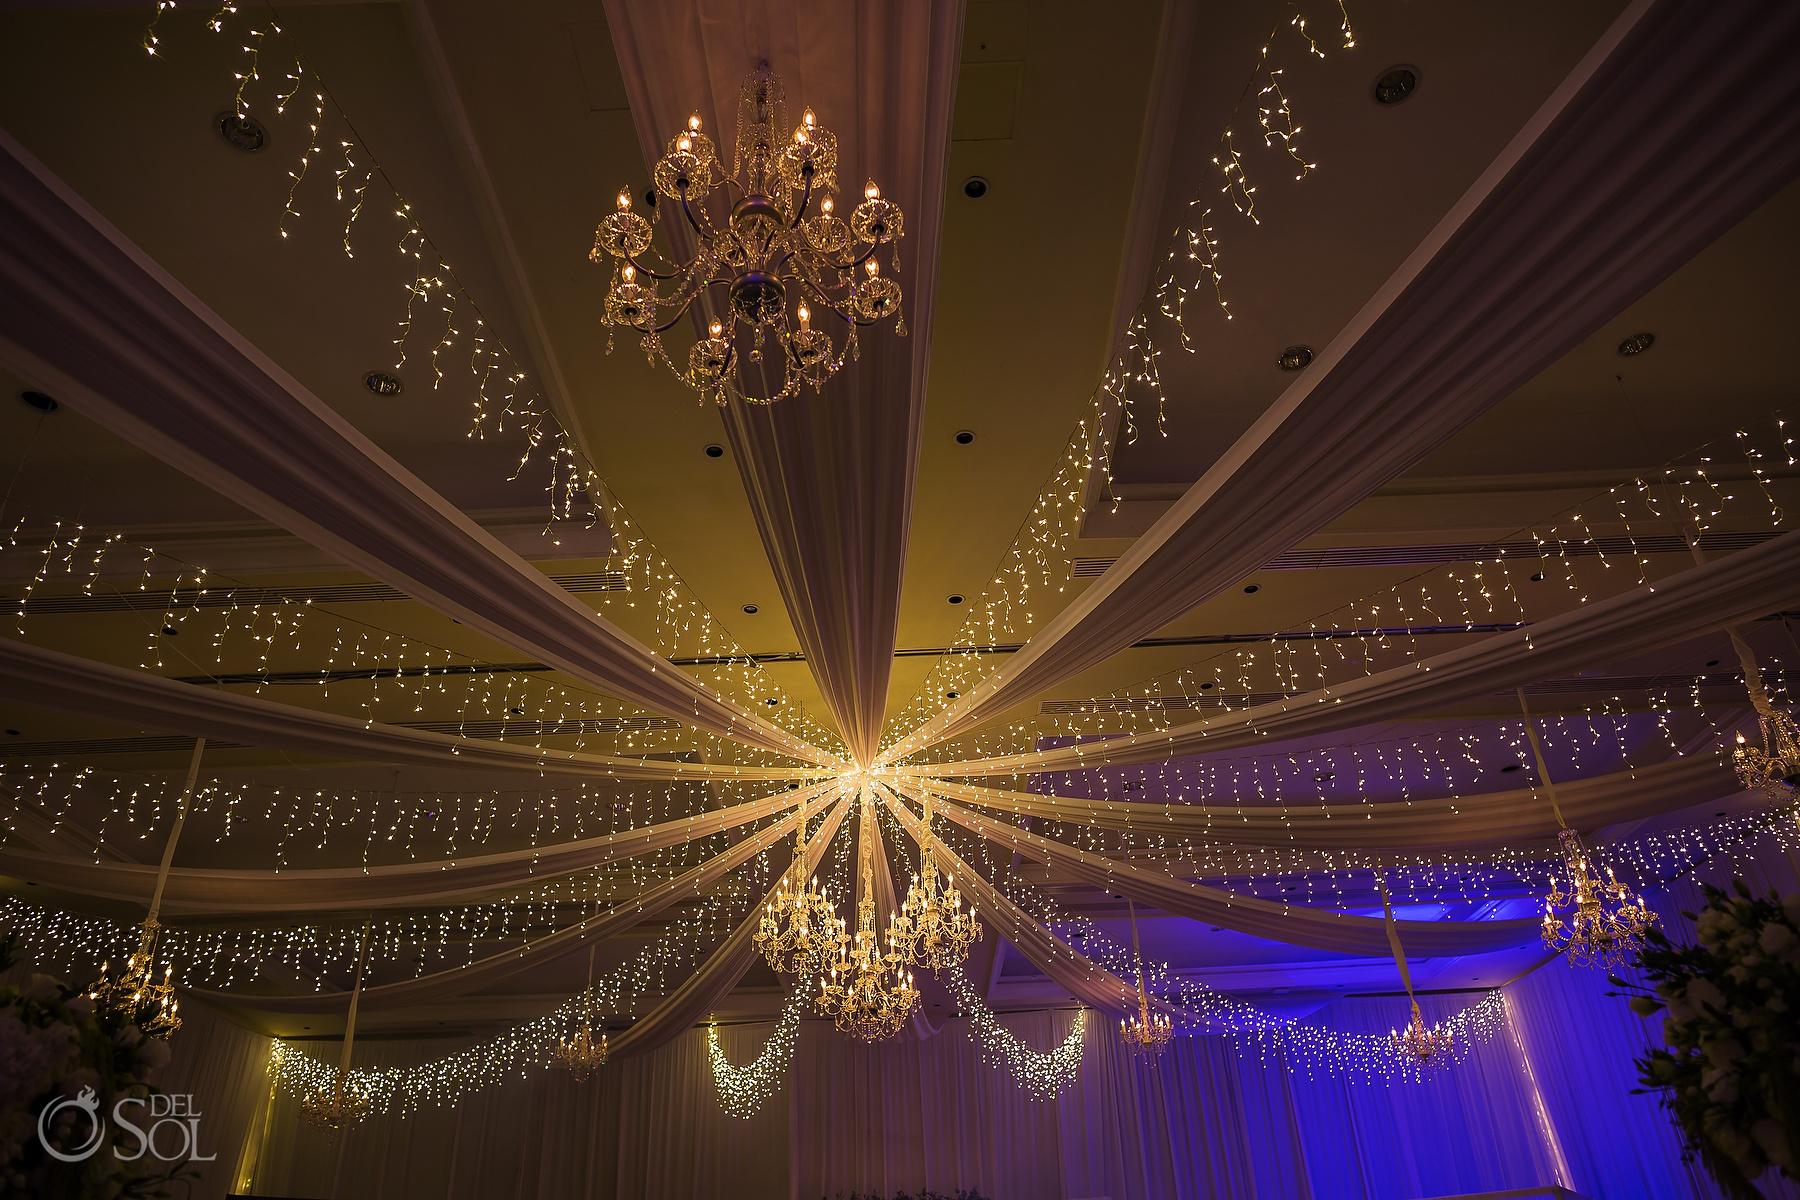 Dreams Tulum Ballroom decor wedding reception Decoration